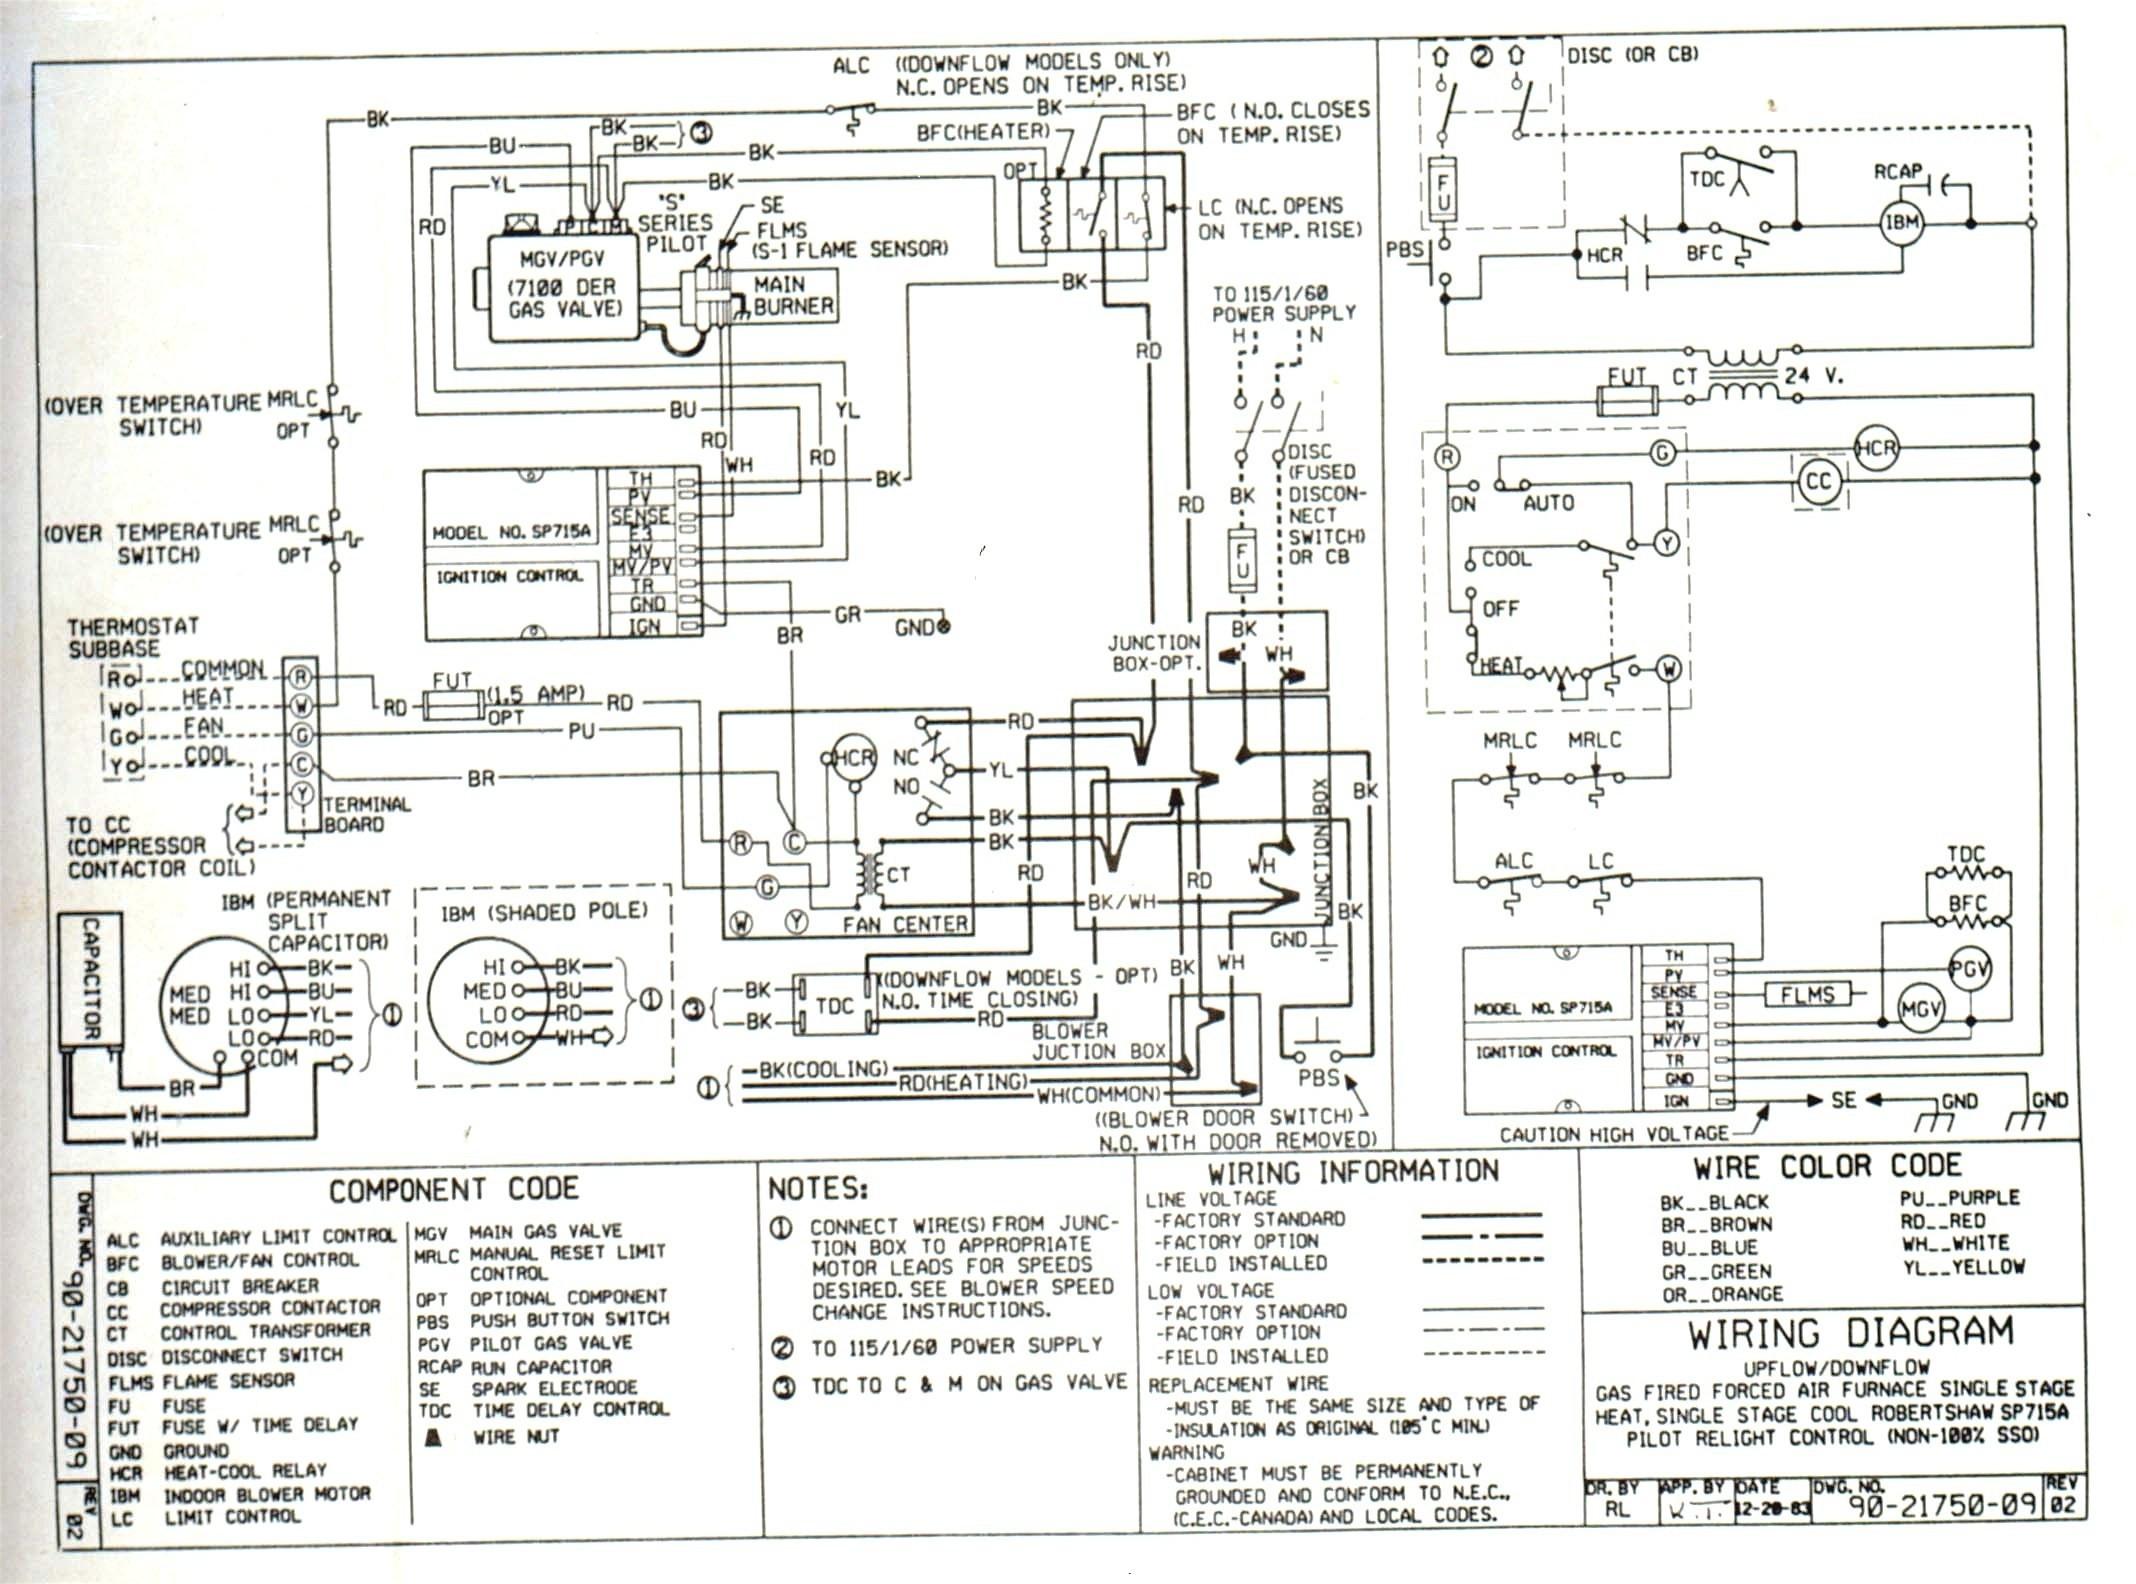 Automotive Air Conditioning System Diagram York Ac Wiring Diagram Of Automotive Air Conditioning System Diagram